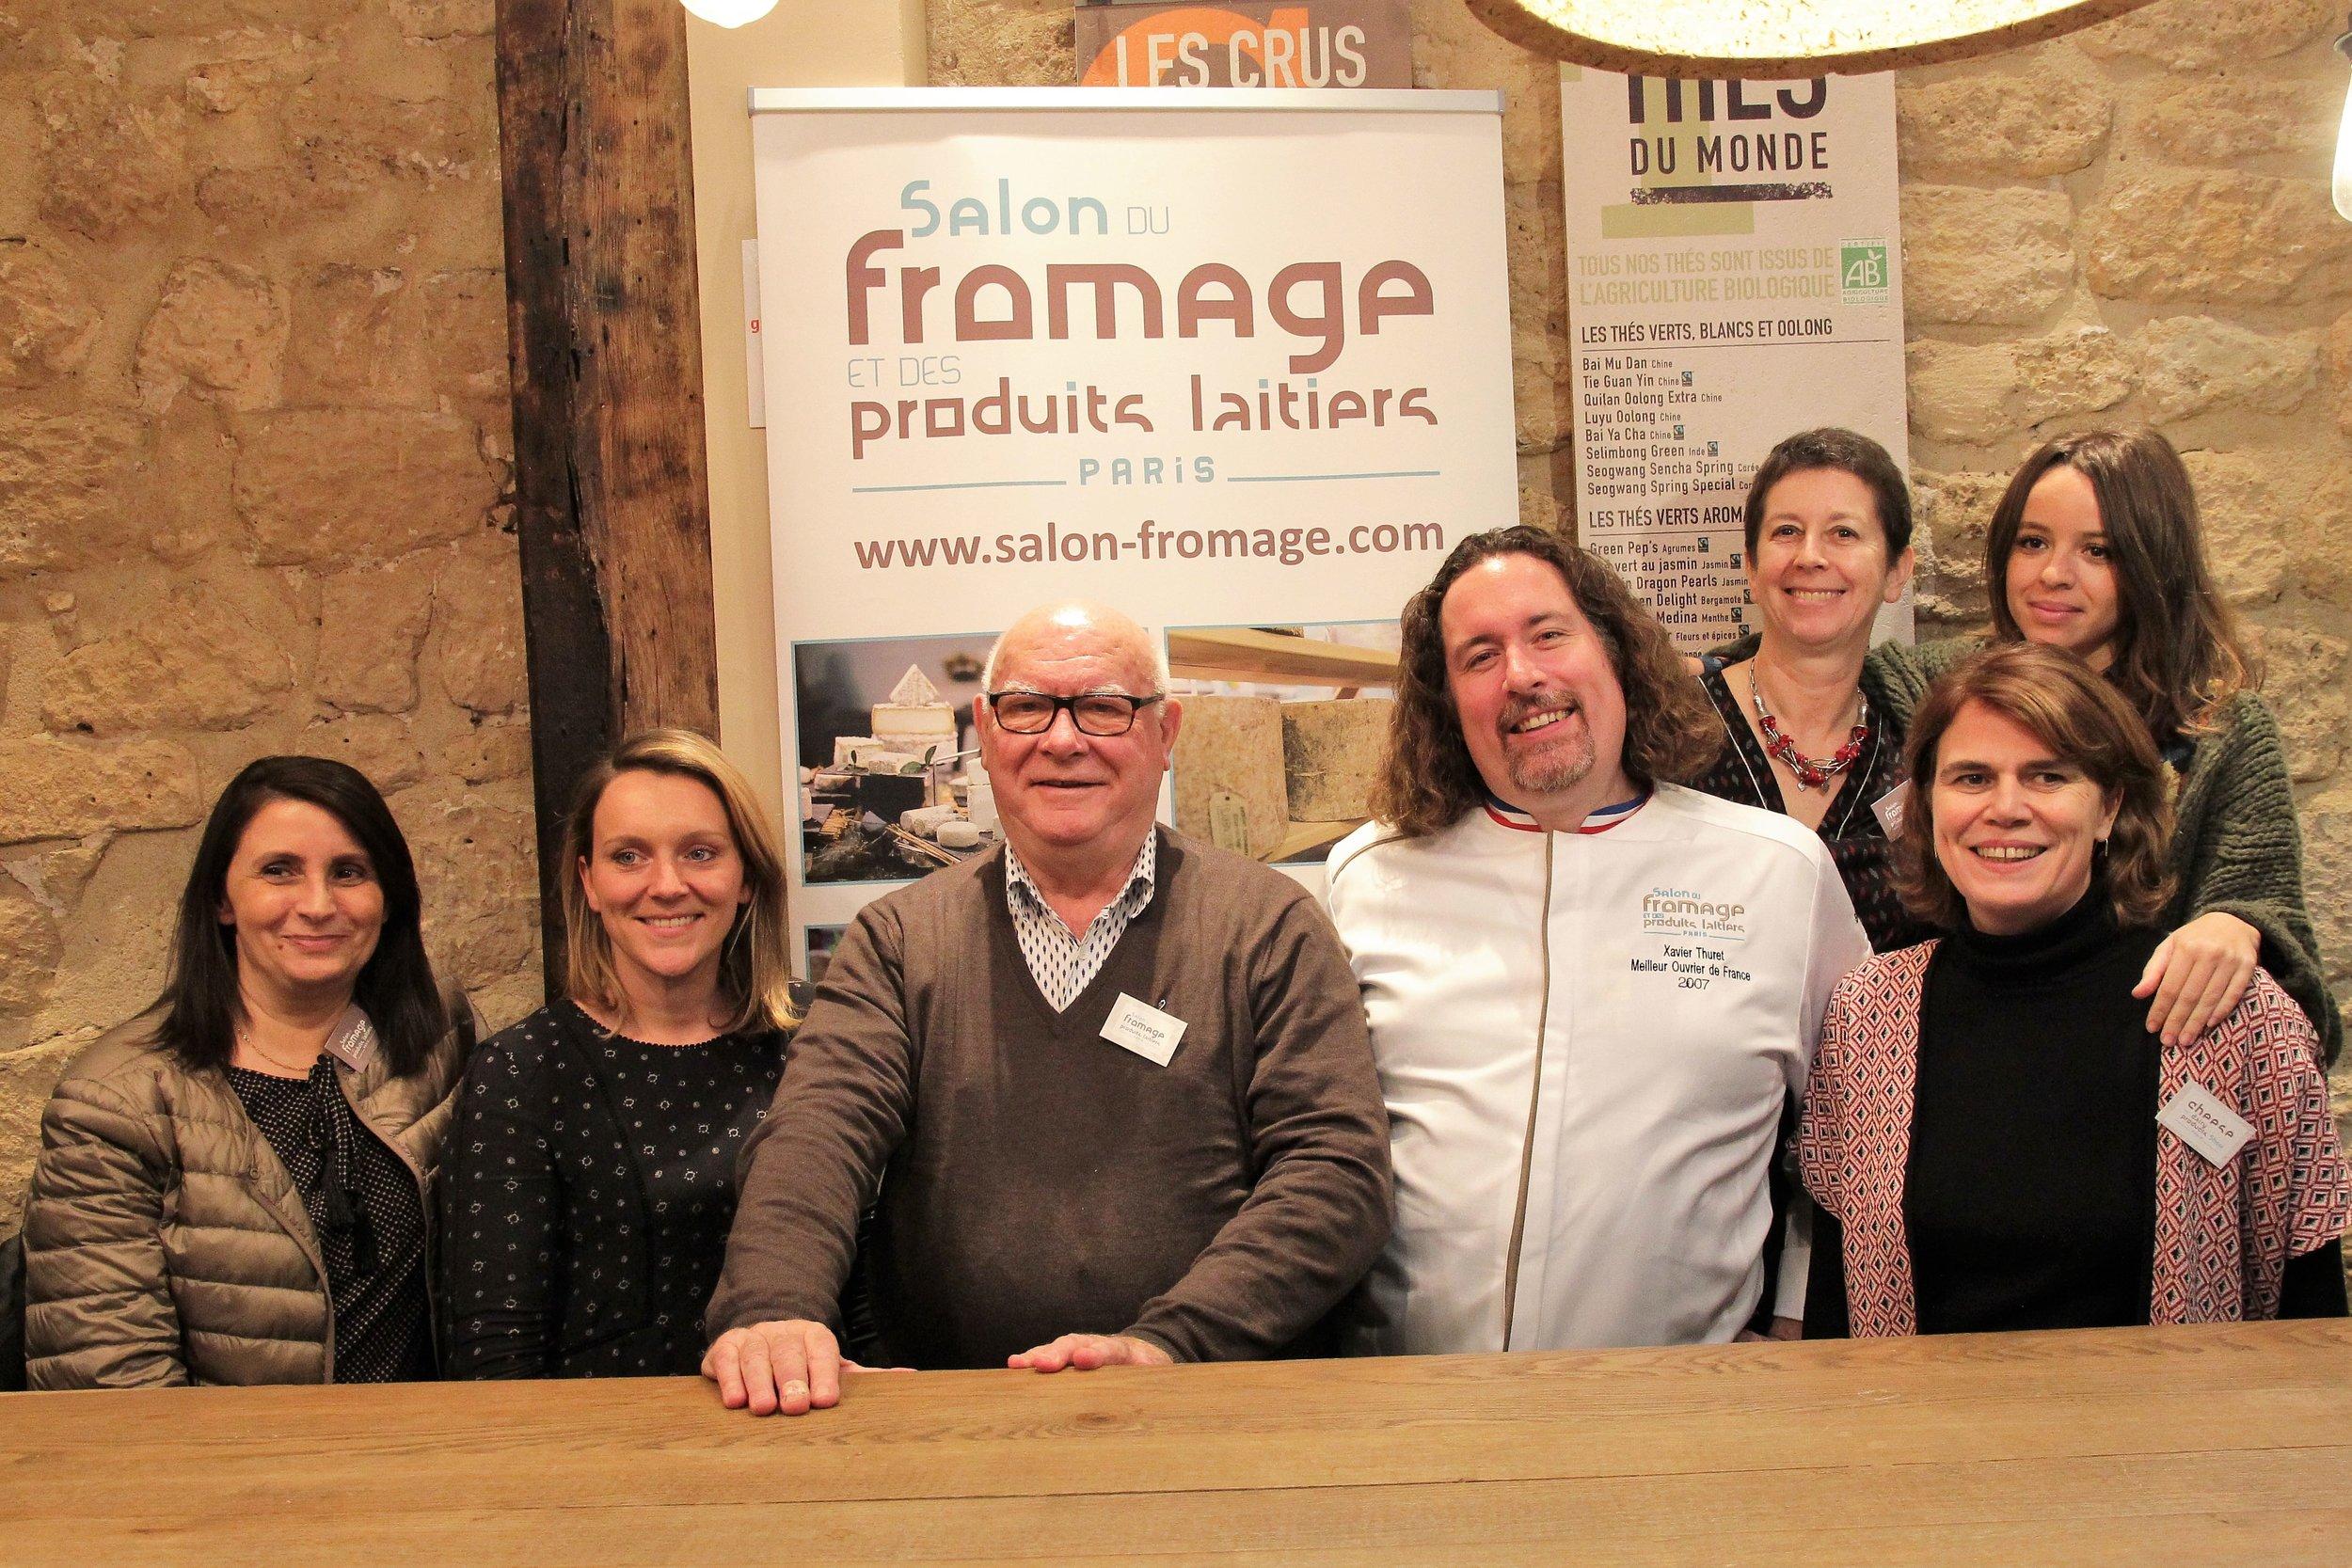 The Salon du Fromage team.